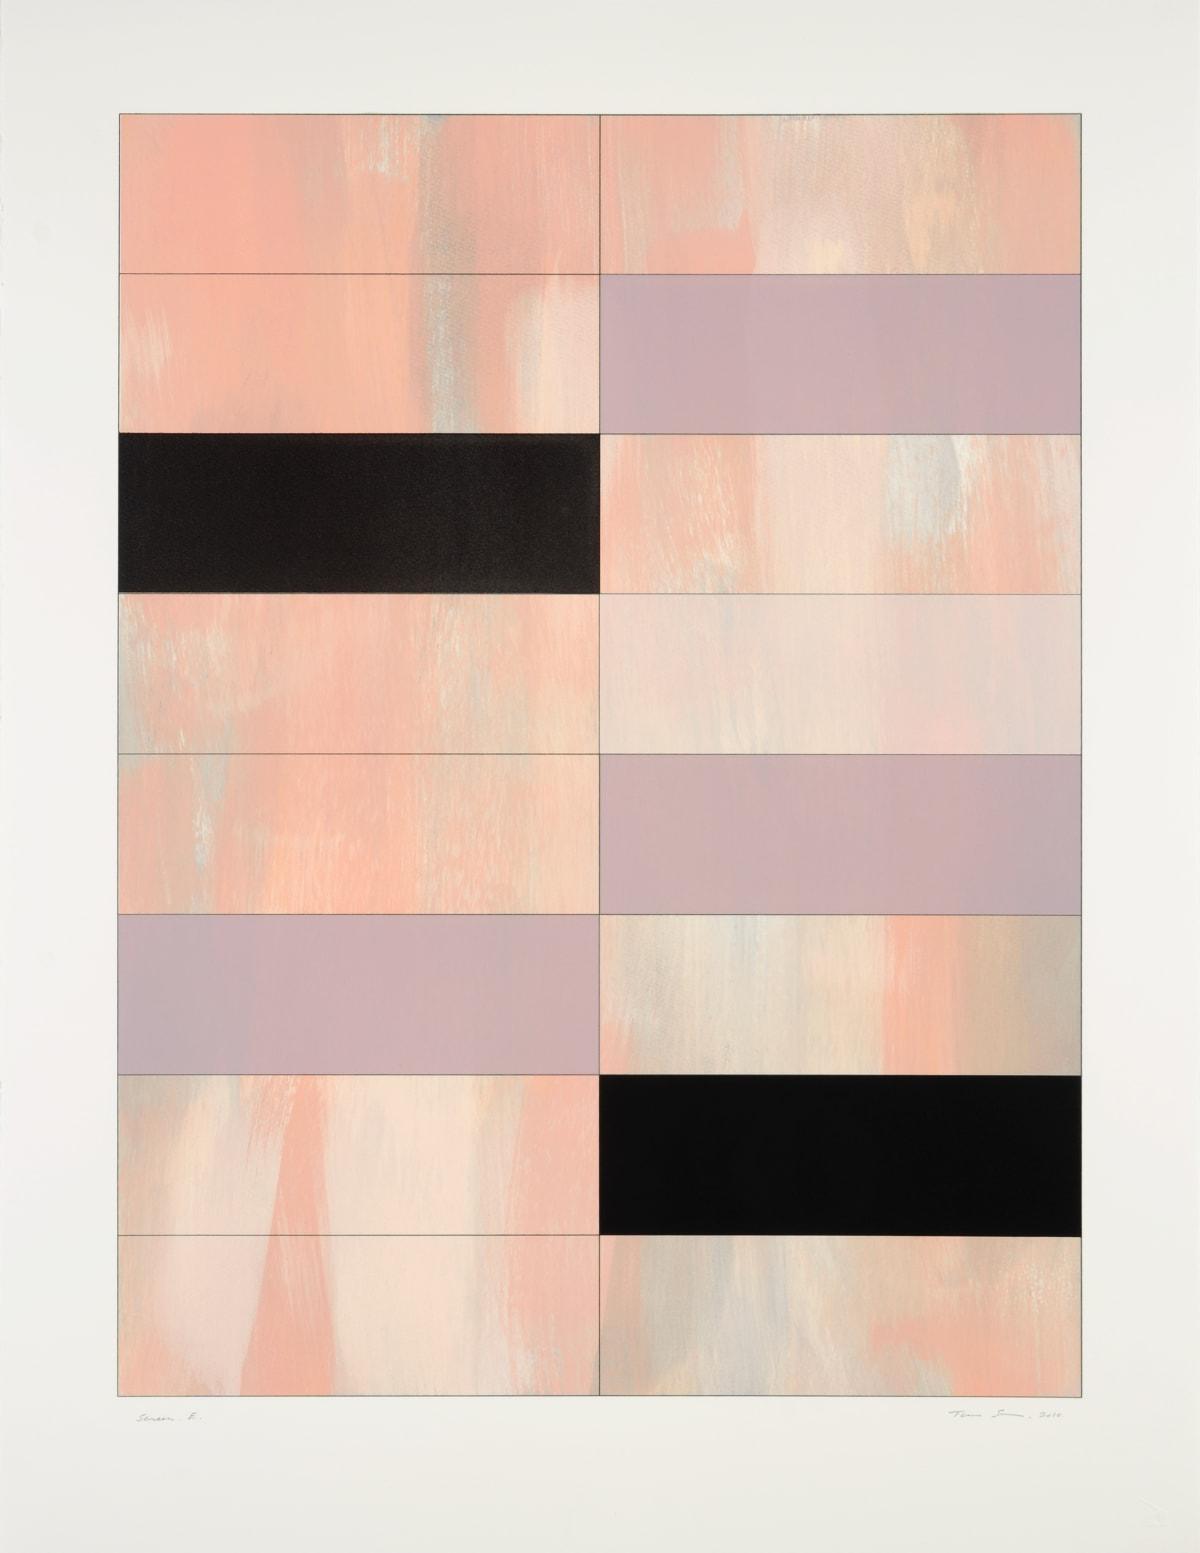 Trevor Sutton b.1948 Screen E, 2010 Monoprint Image: 71 x 53.5 cm Paper: 86.5 x 66 cm